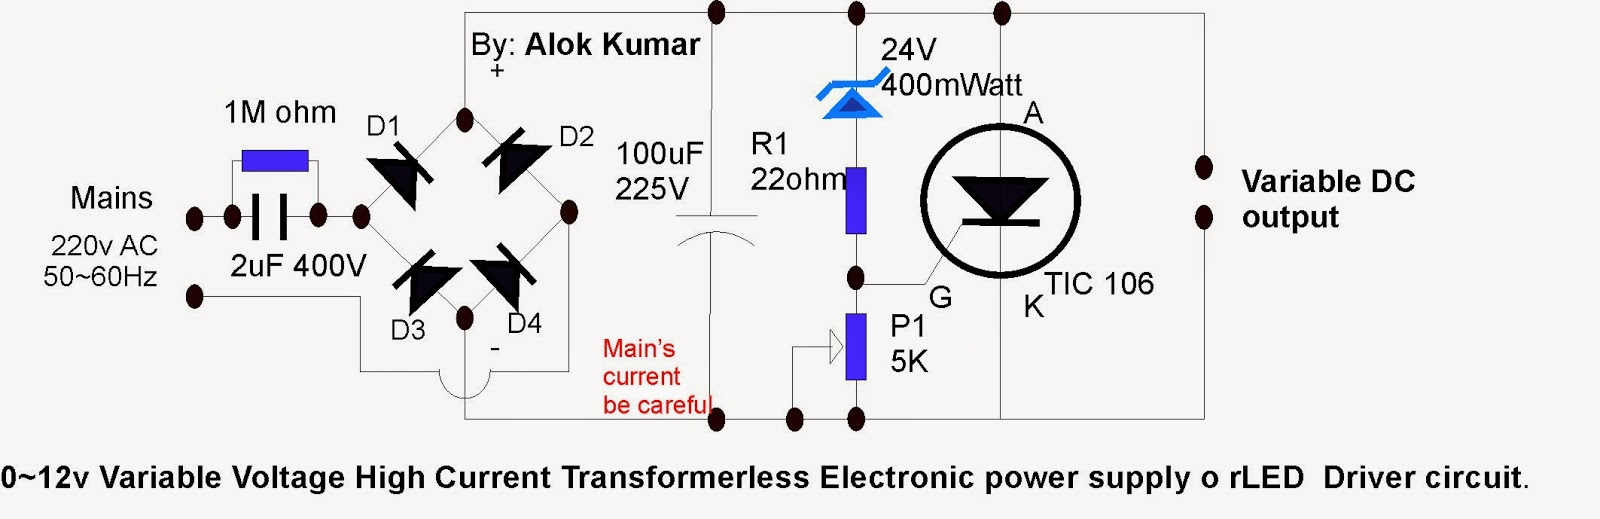 circuit diagram [ 1600 x 519 Pixel ]